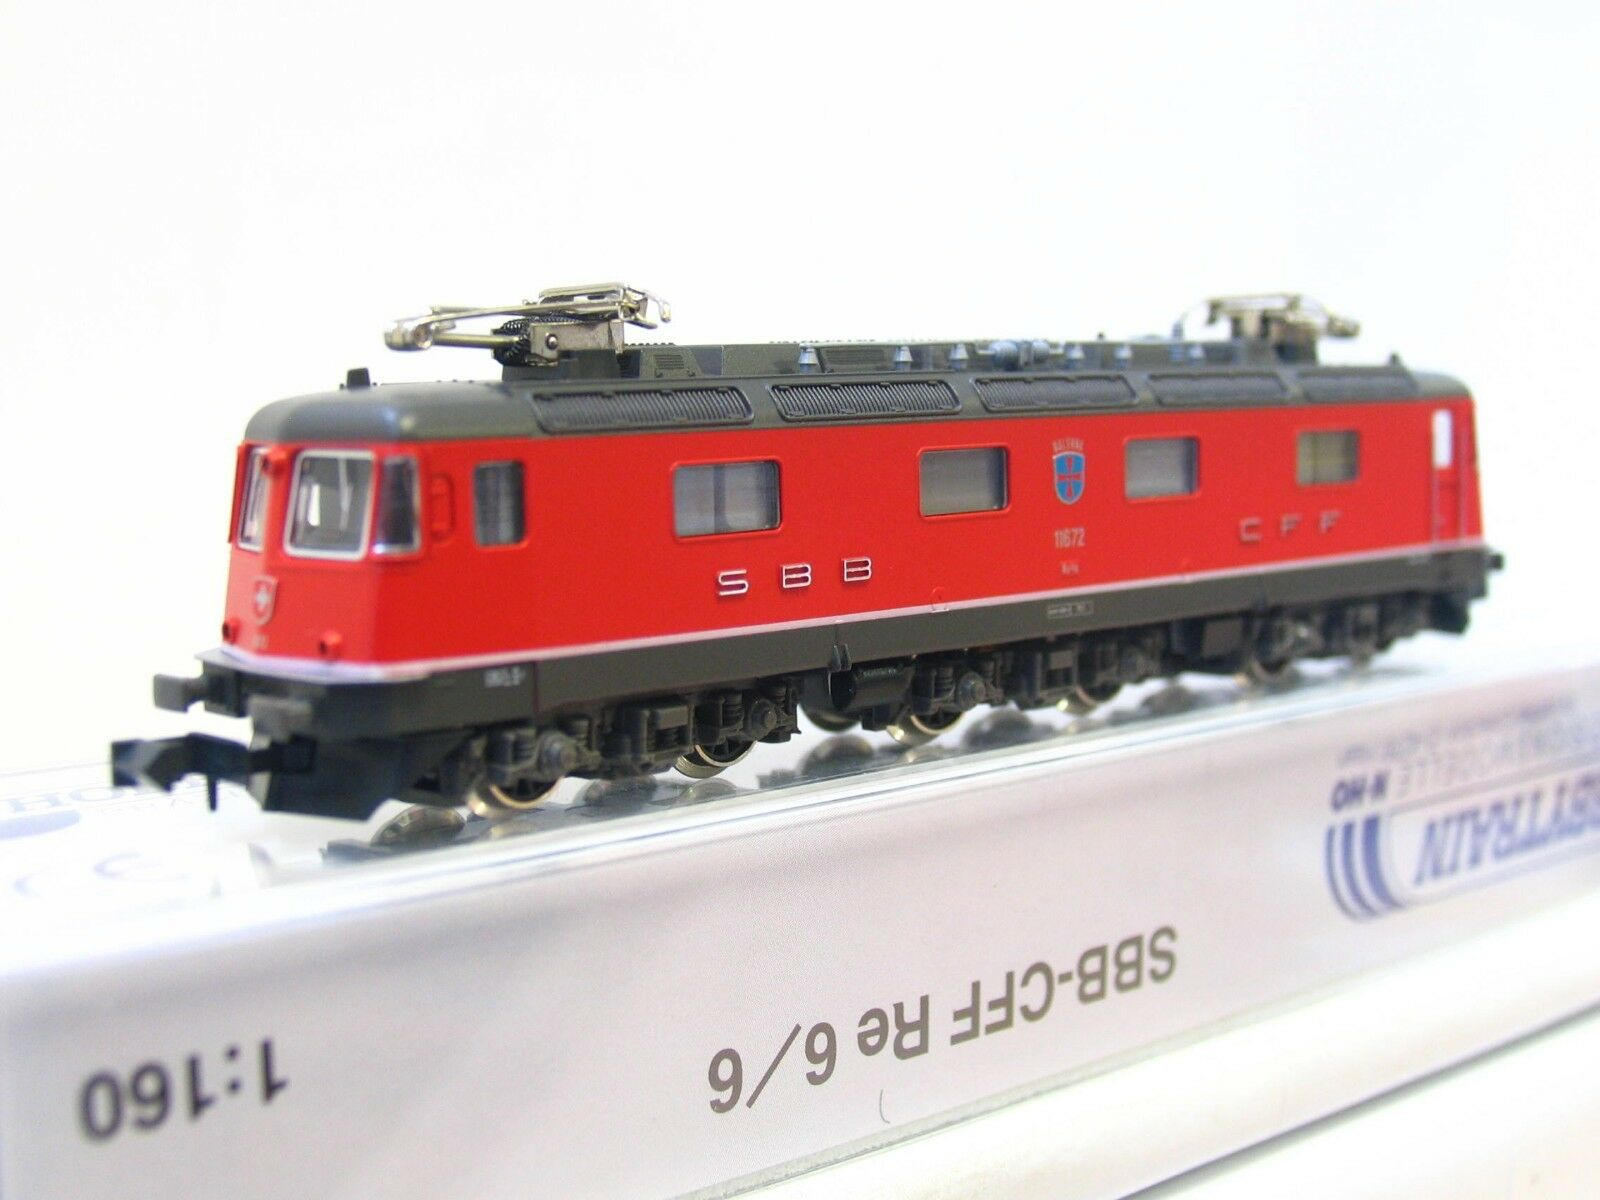 70% de descuento Hobbytrain n h10110 e-Lok e-Lok e-Lok re 6 6 11672 balerna SBB CFF FMS embalaje original (v9920)  ofreciendo 100%